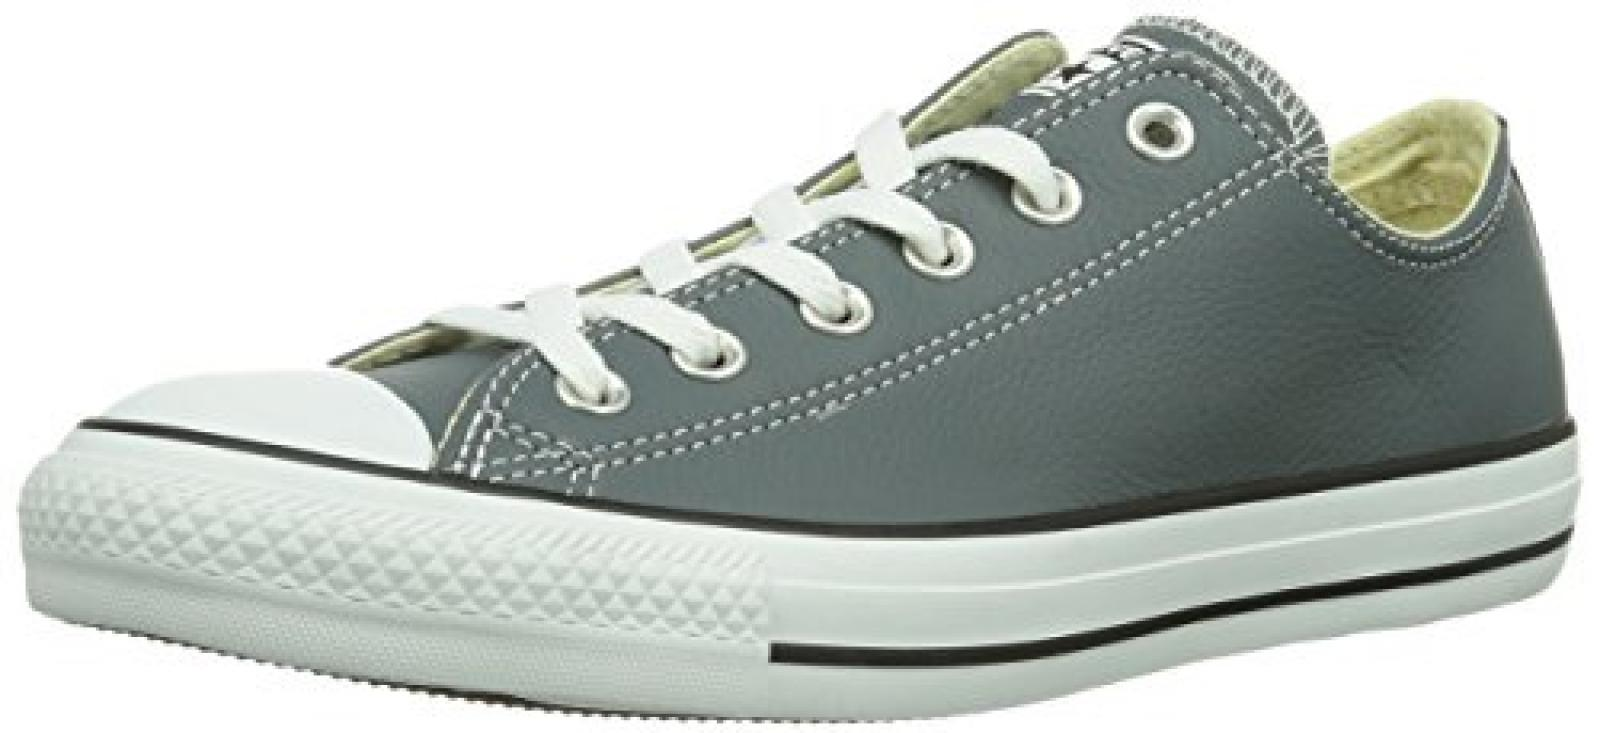 Converse Chuck Taylor All Star Adulte Seasonal Leather Ox 381080 Unisex - Erwachsene Sneaker